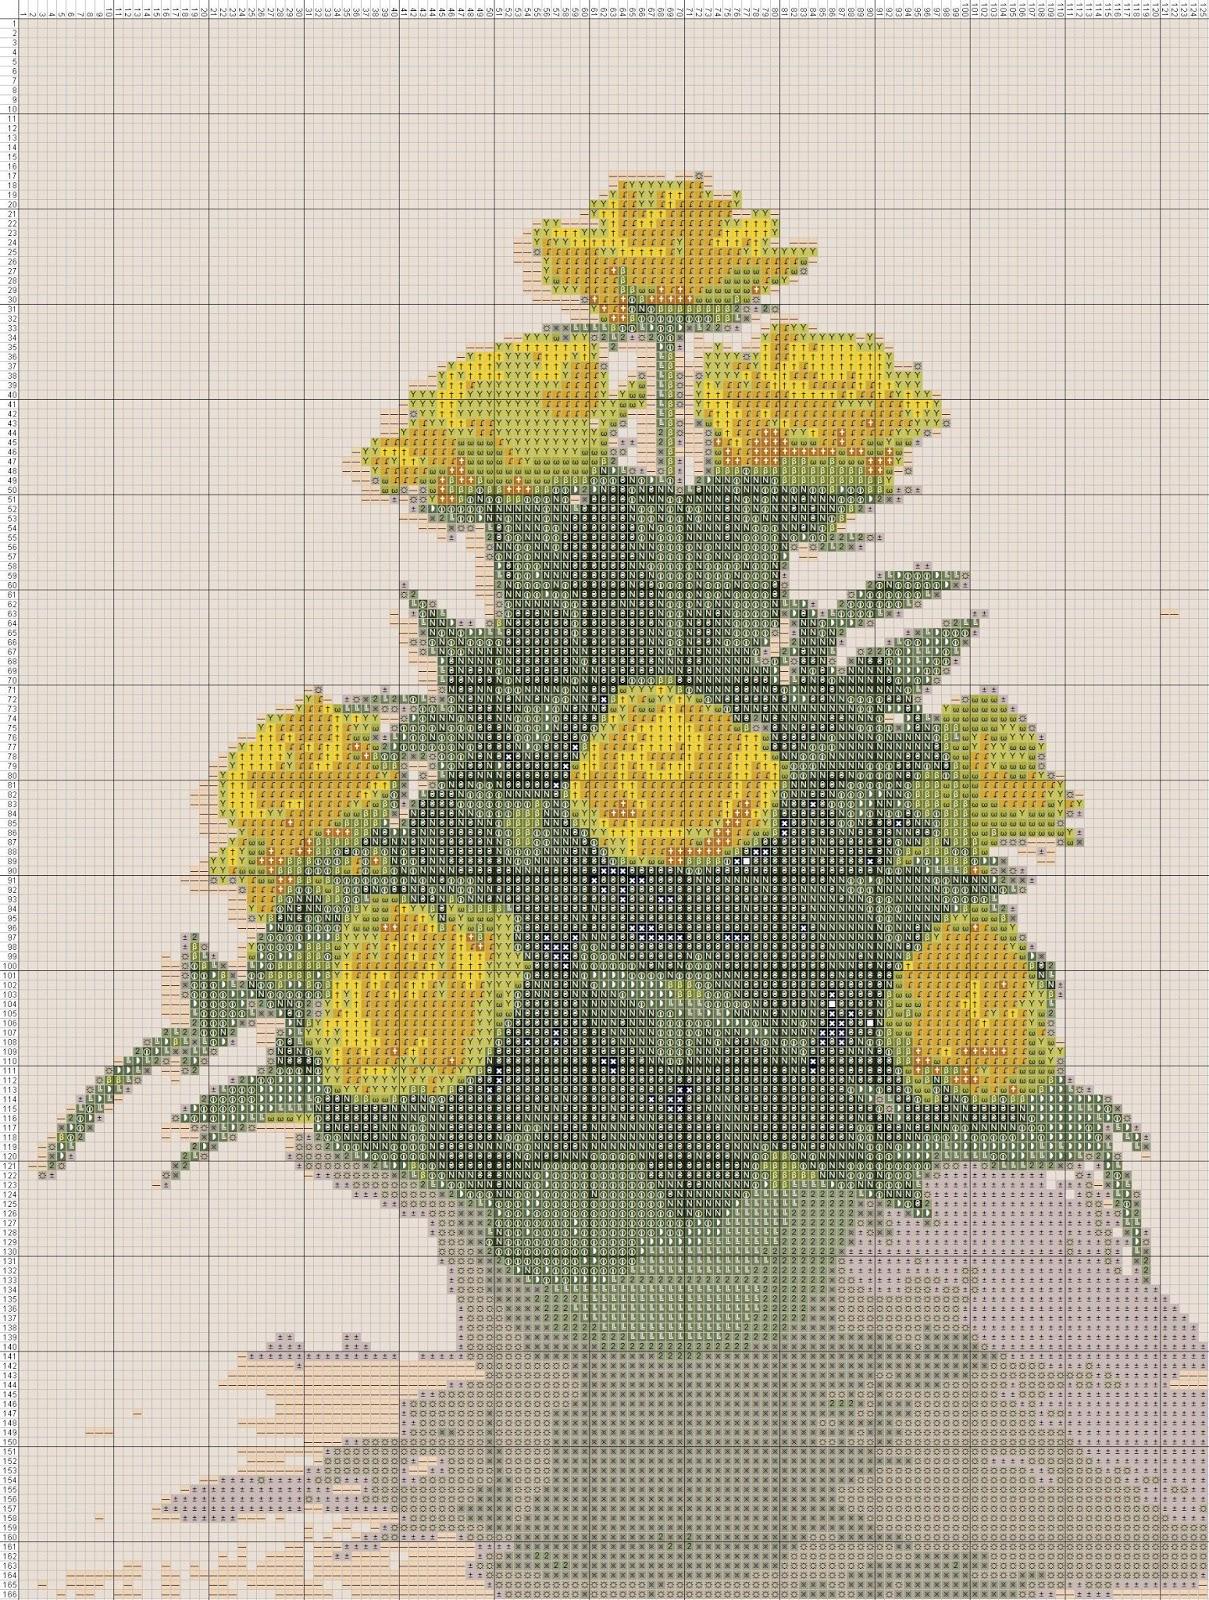 gambar pola kristik rangkaian bunga mawar kuning gambar bunga kecubung